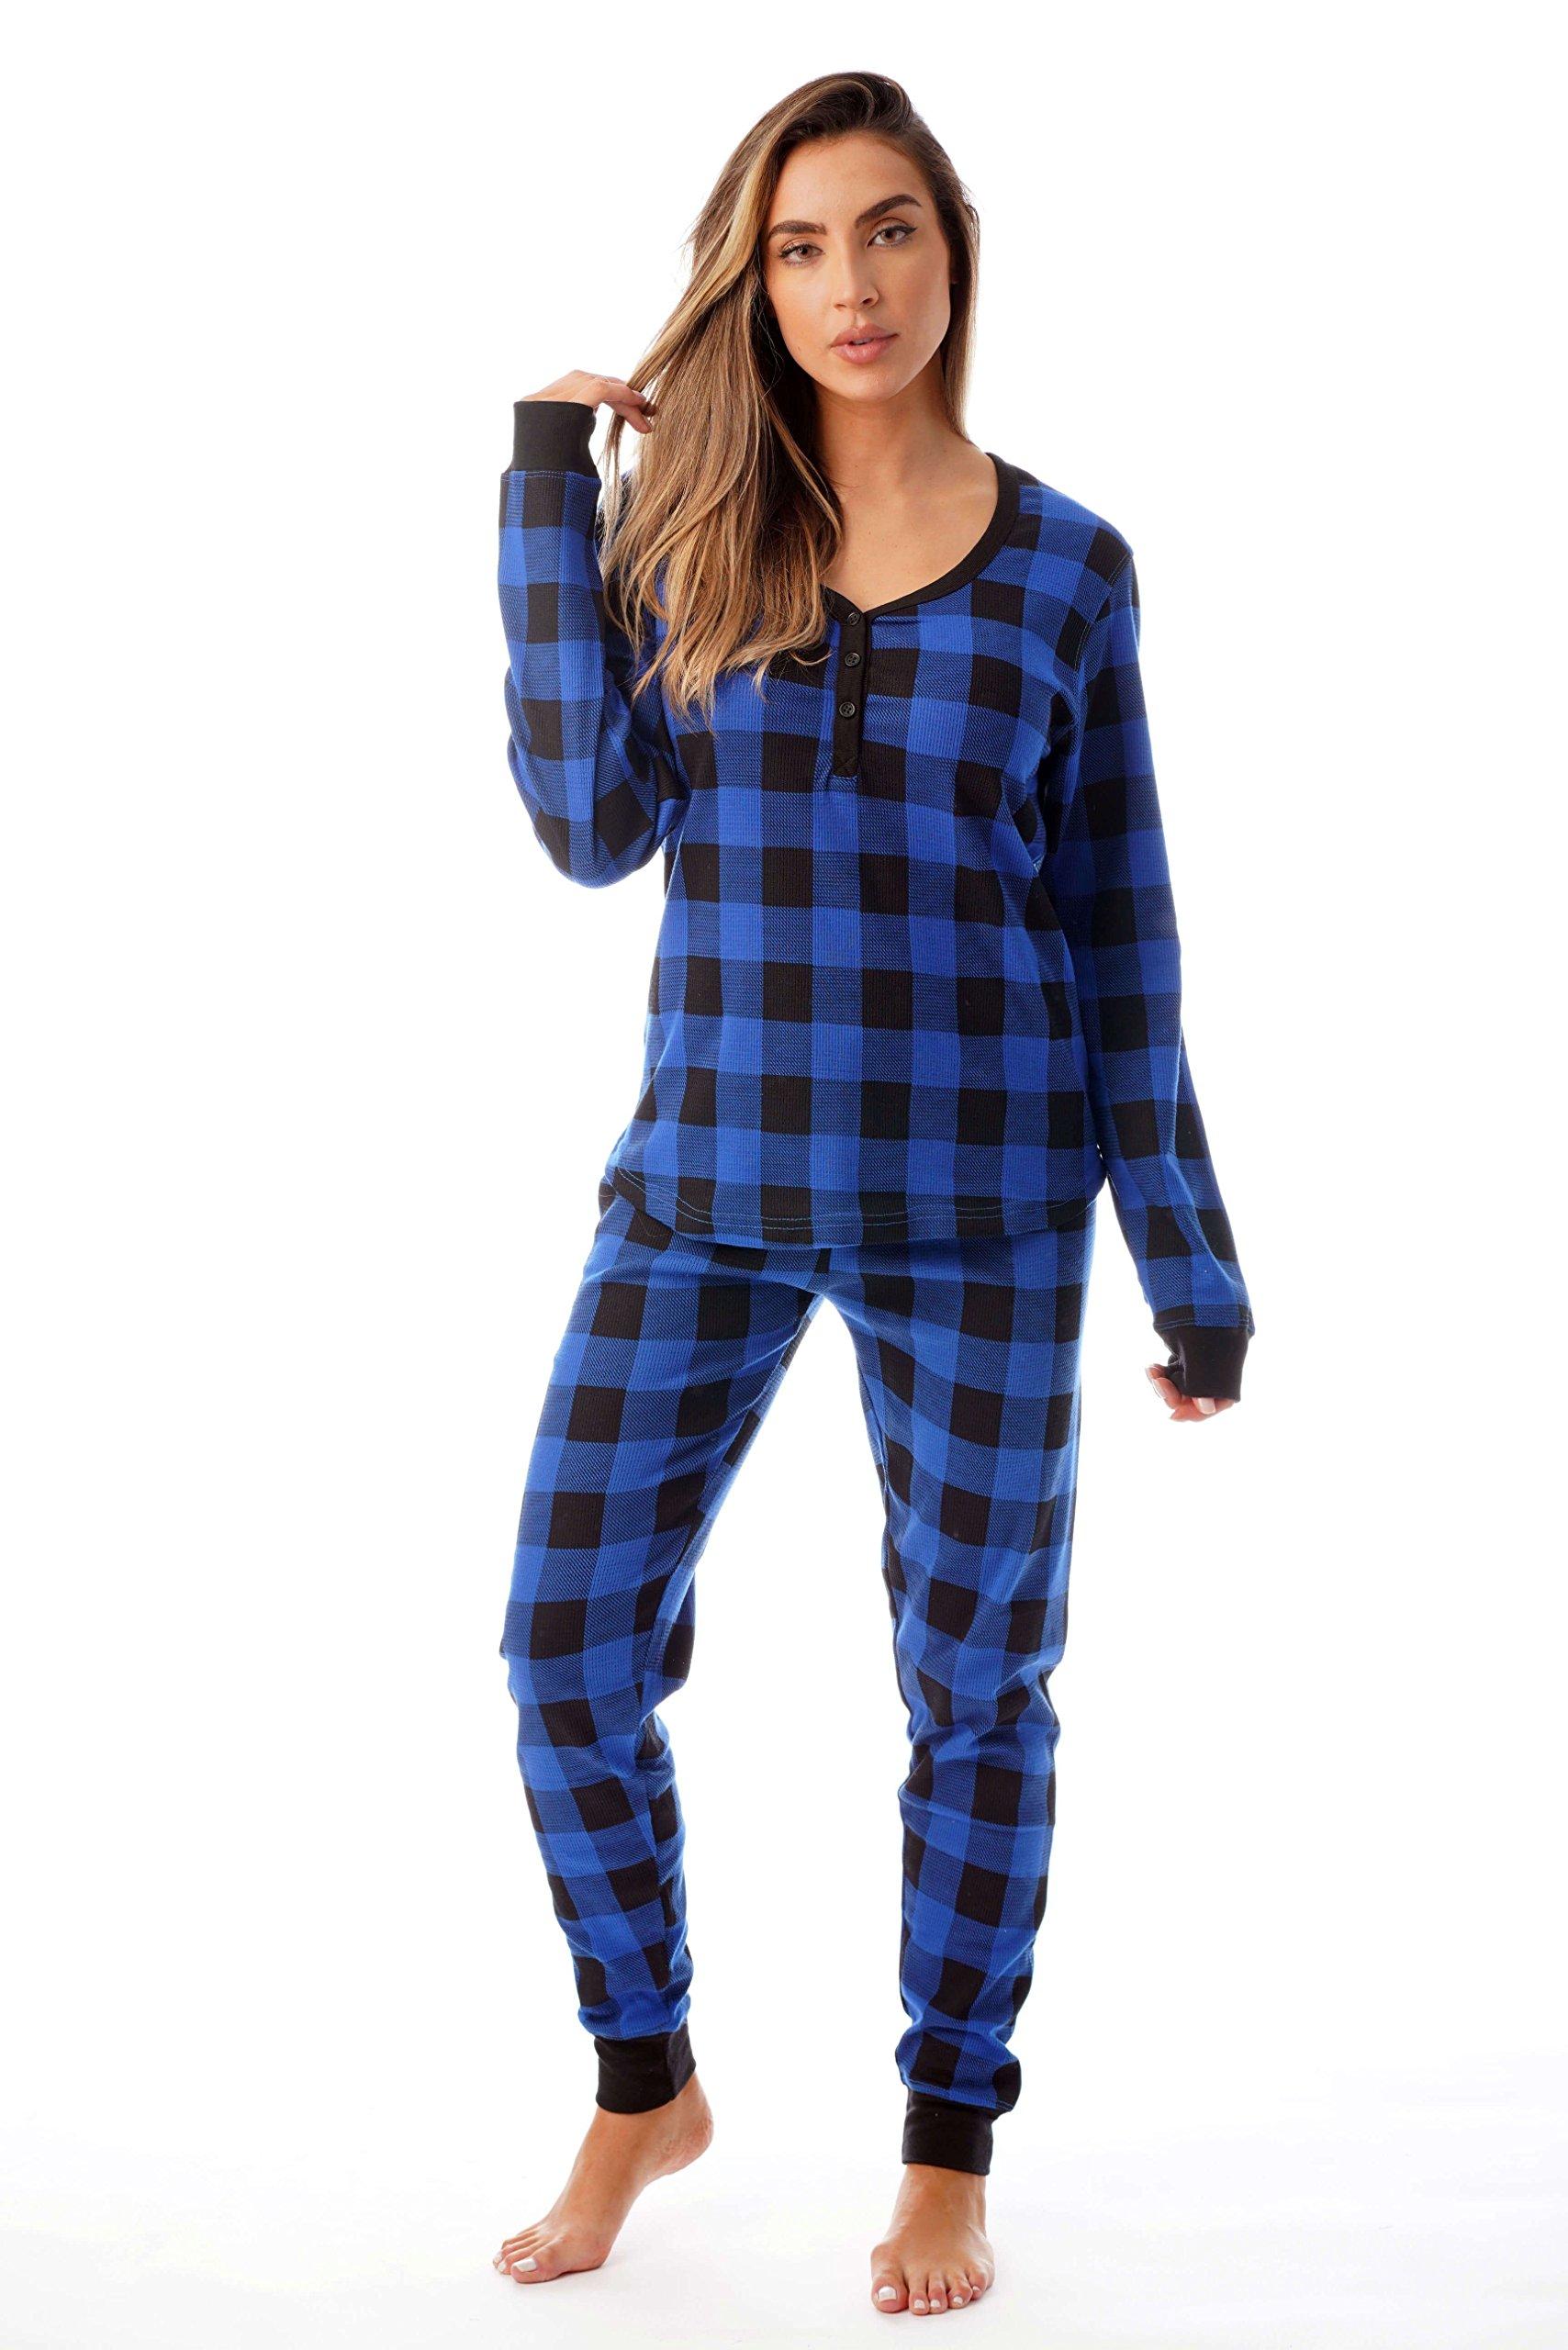 #followme Buffalo Plaid 2 Piece Base Layer Thermal Underwear Set for Women 6372-10195-NEW-ROY-XL